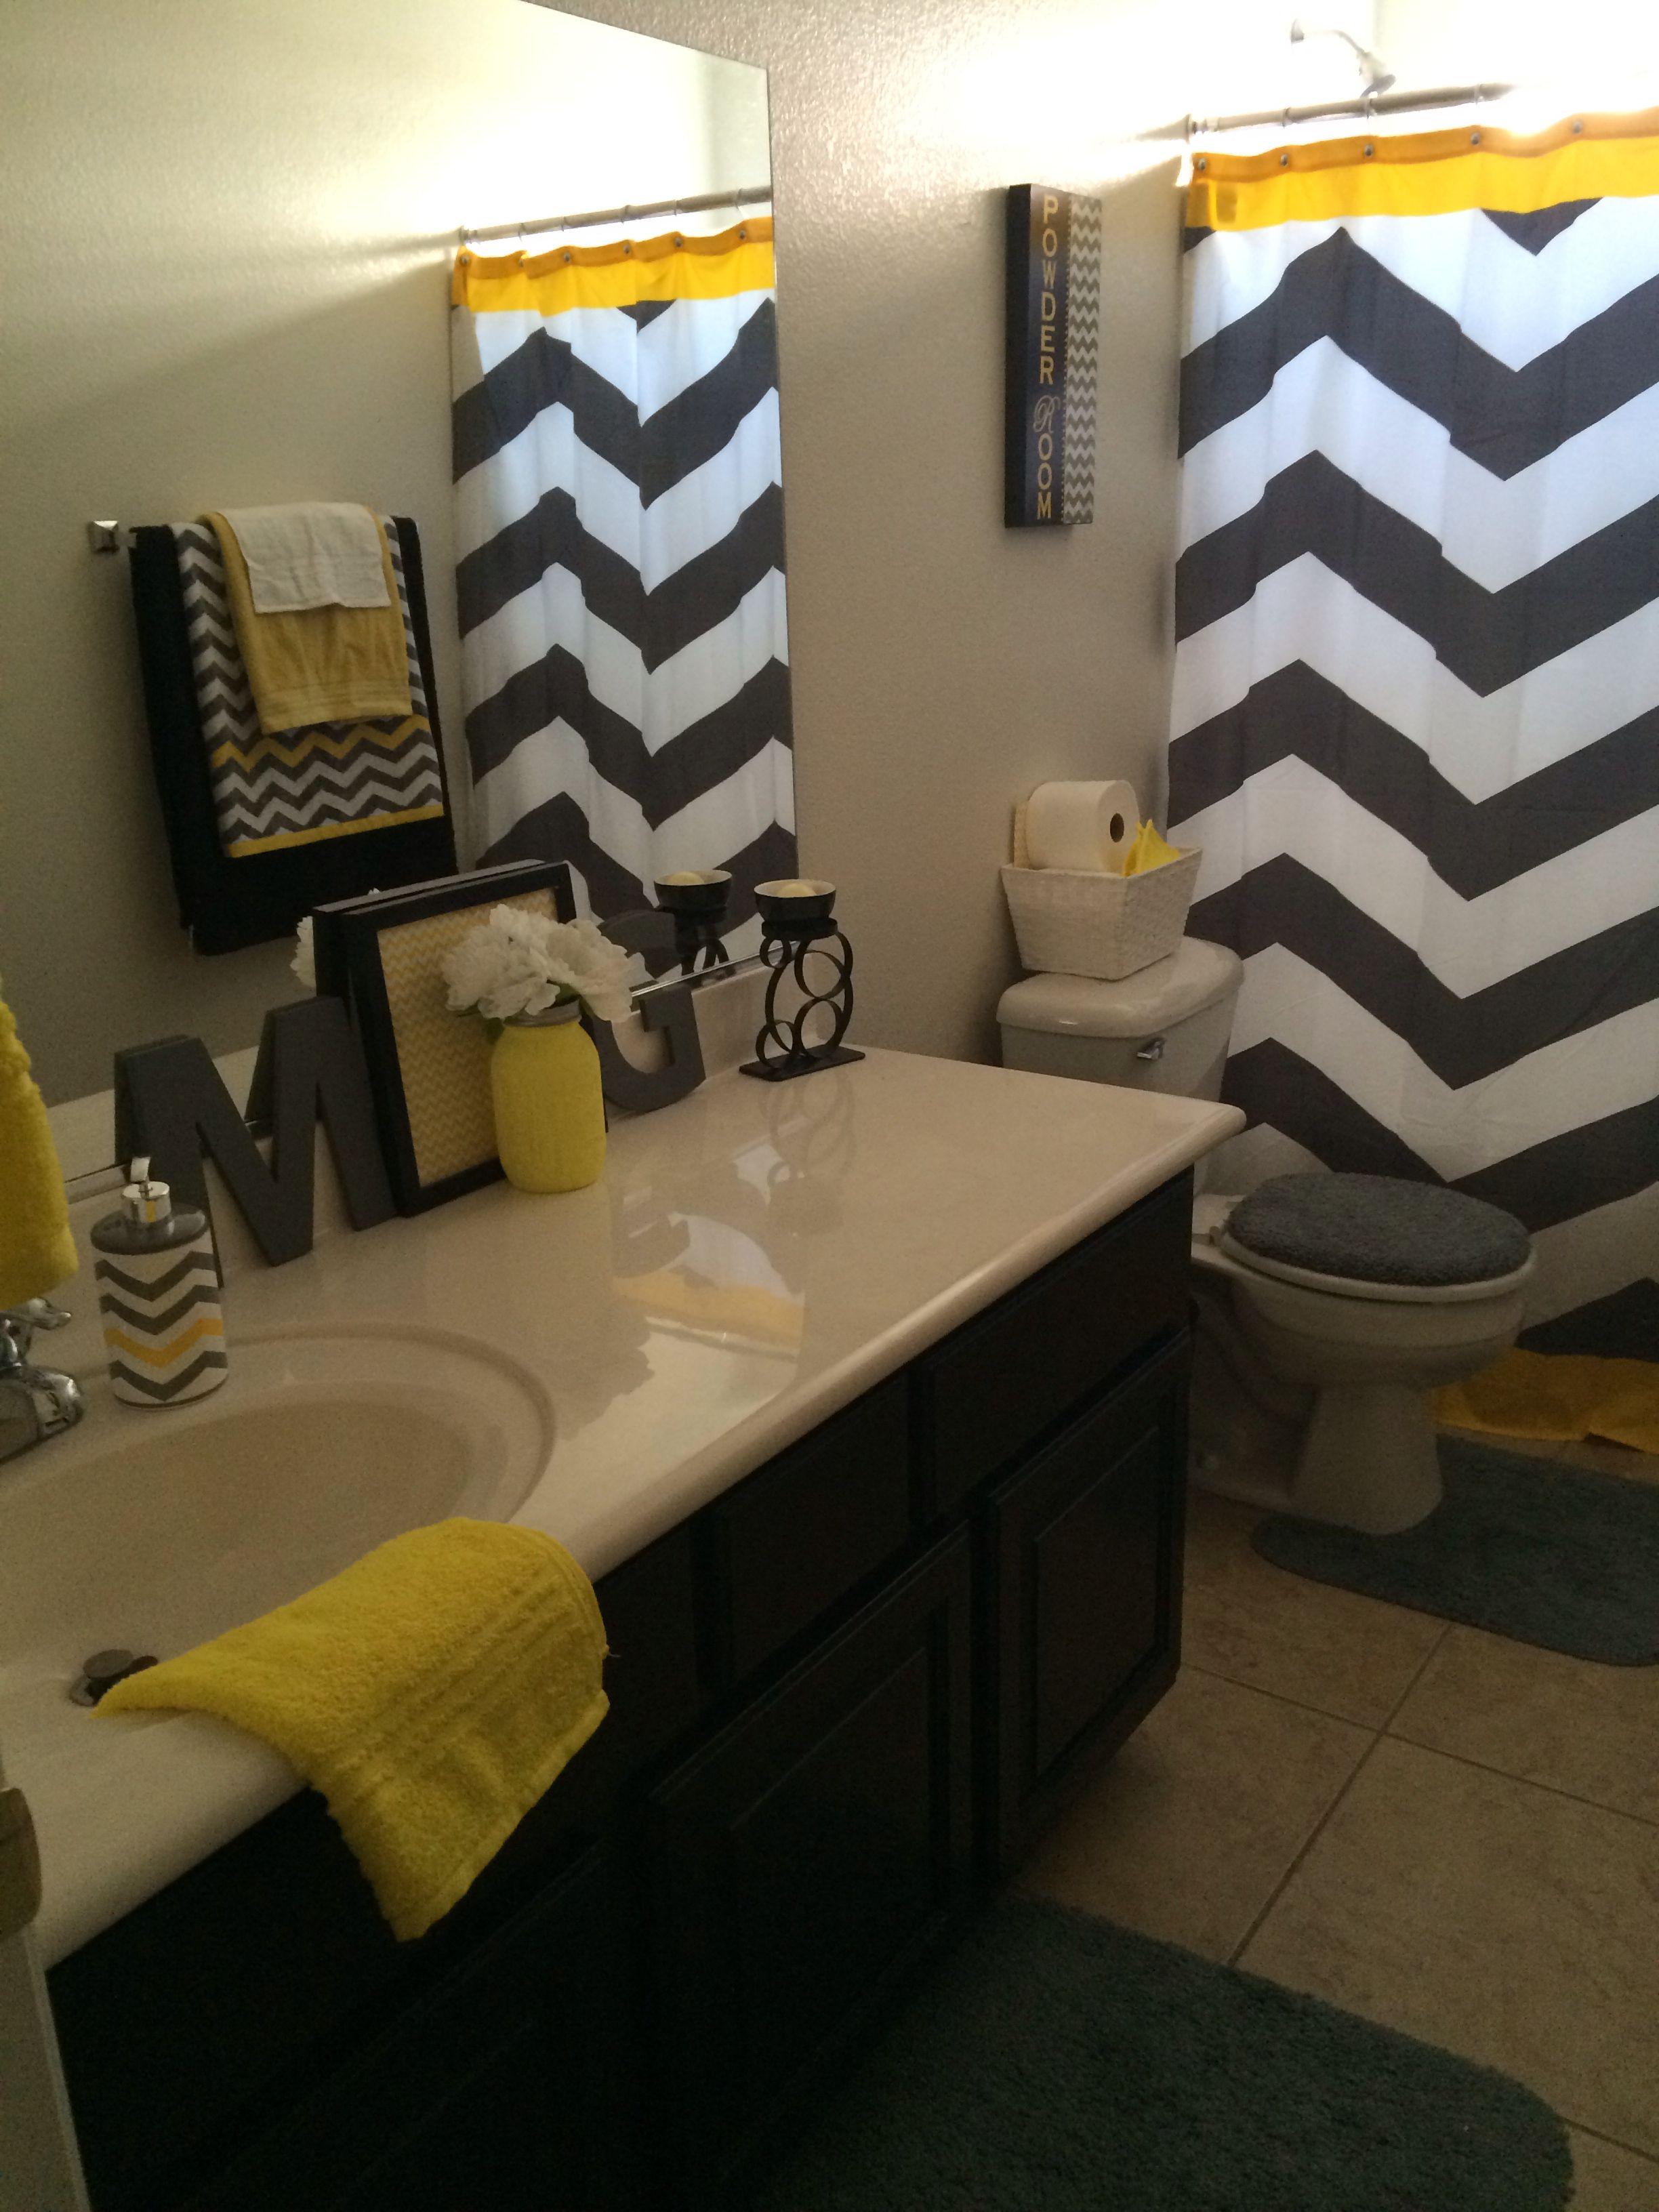 my new cheerful gender neutral bathroom yellow black grey and bathroom decor idea my new cheerful gender neutral bathroom yellow black grey and white